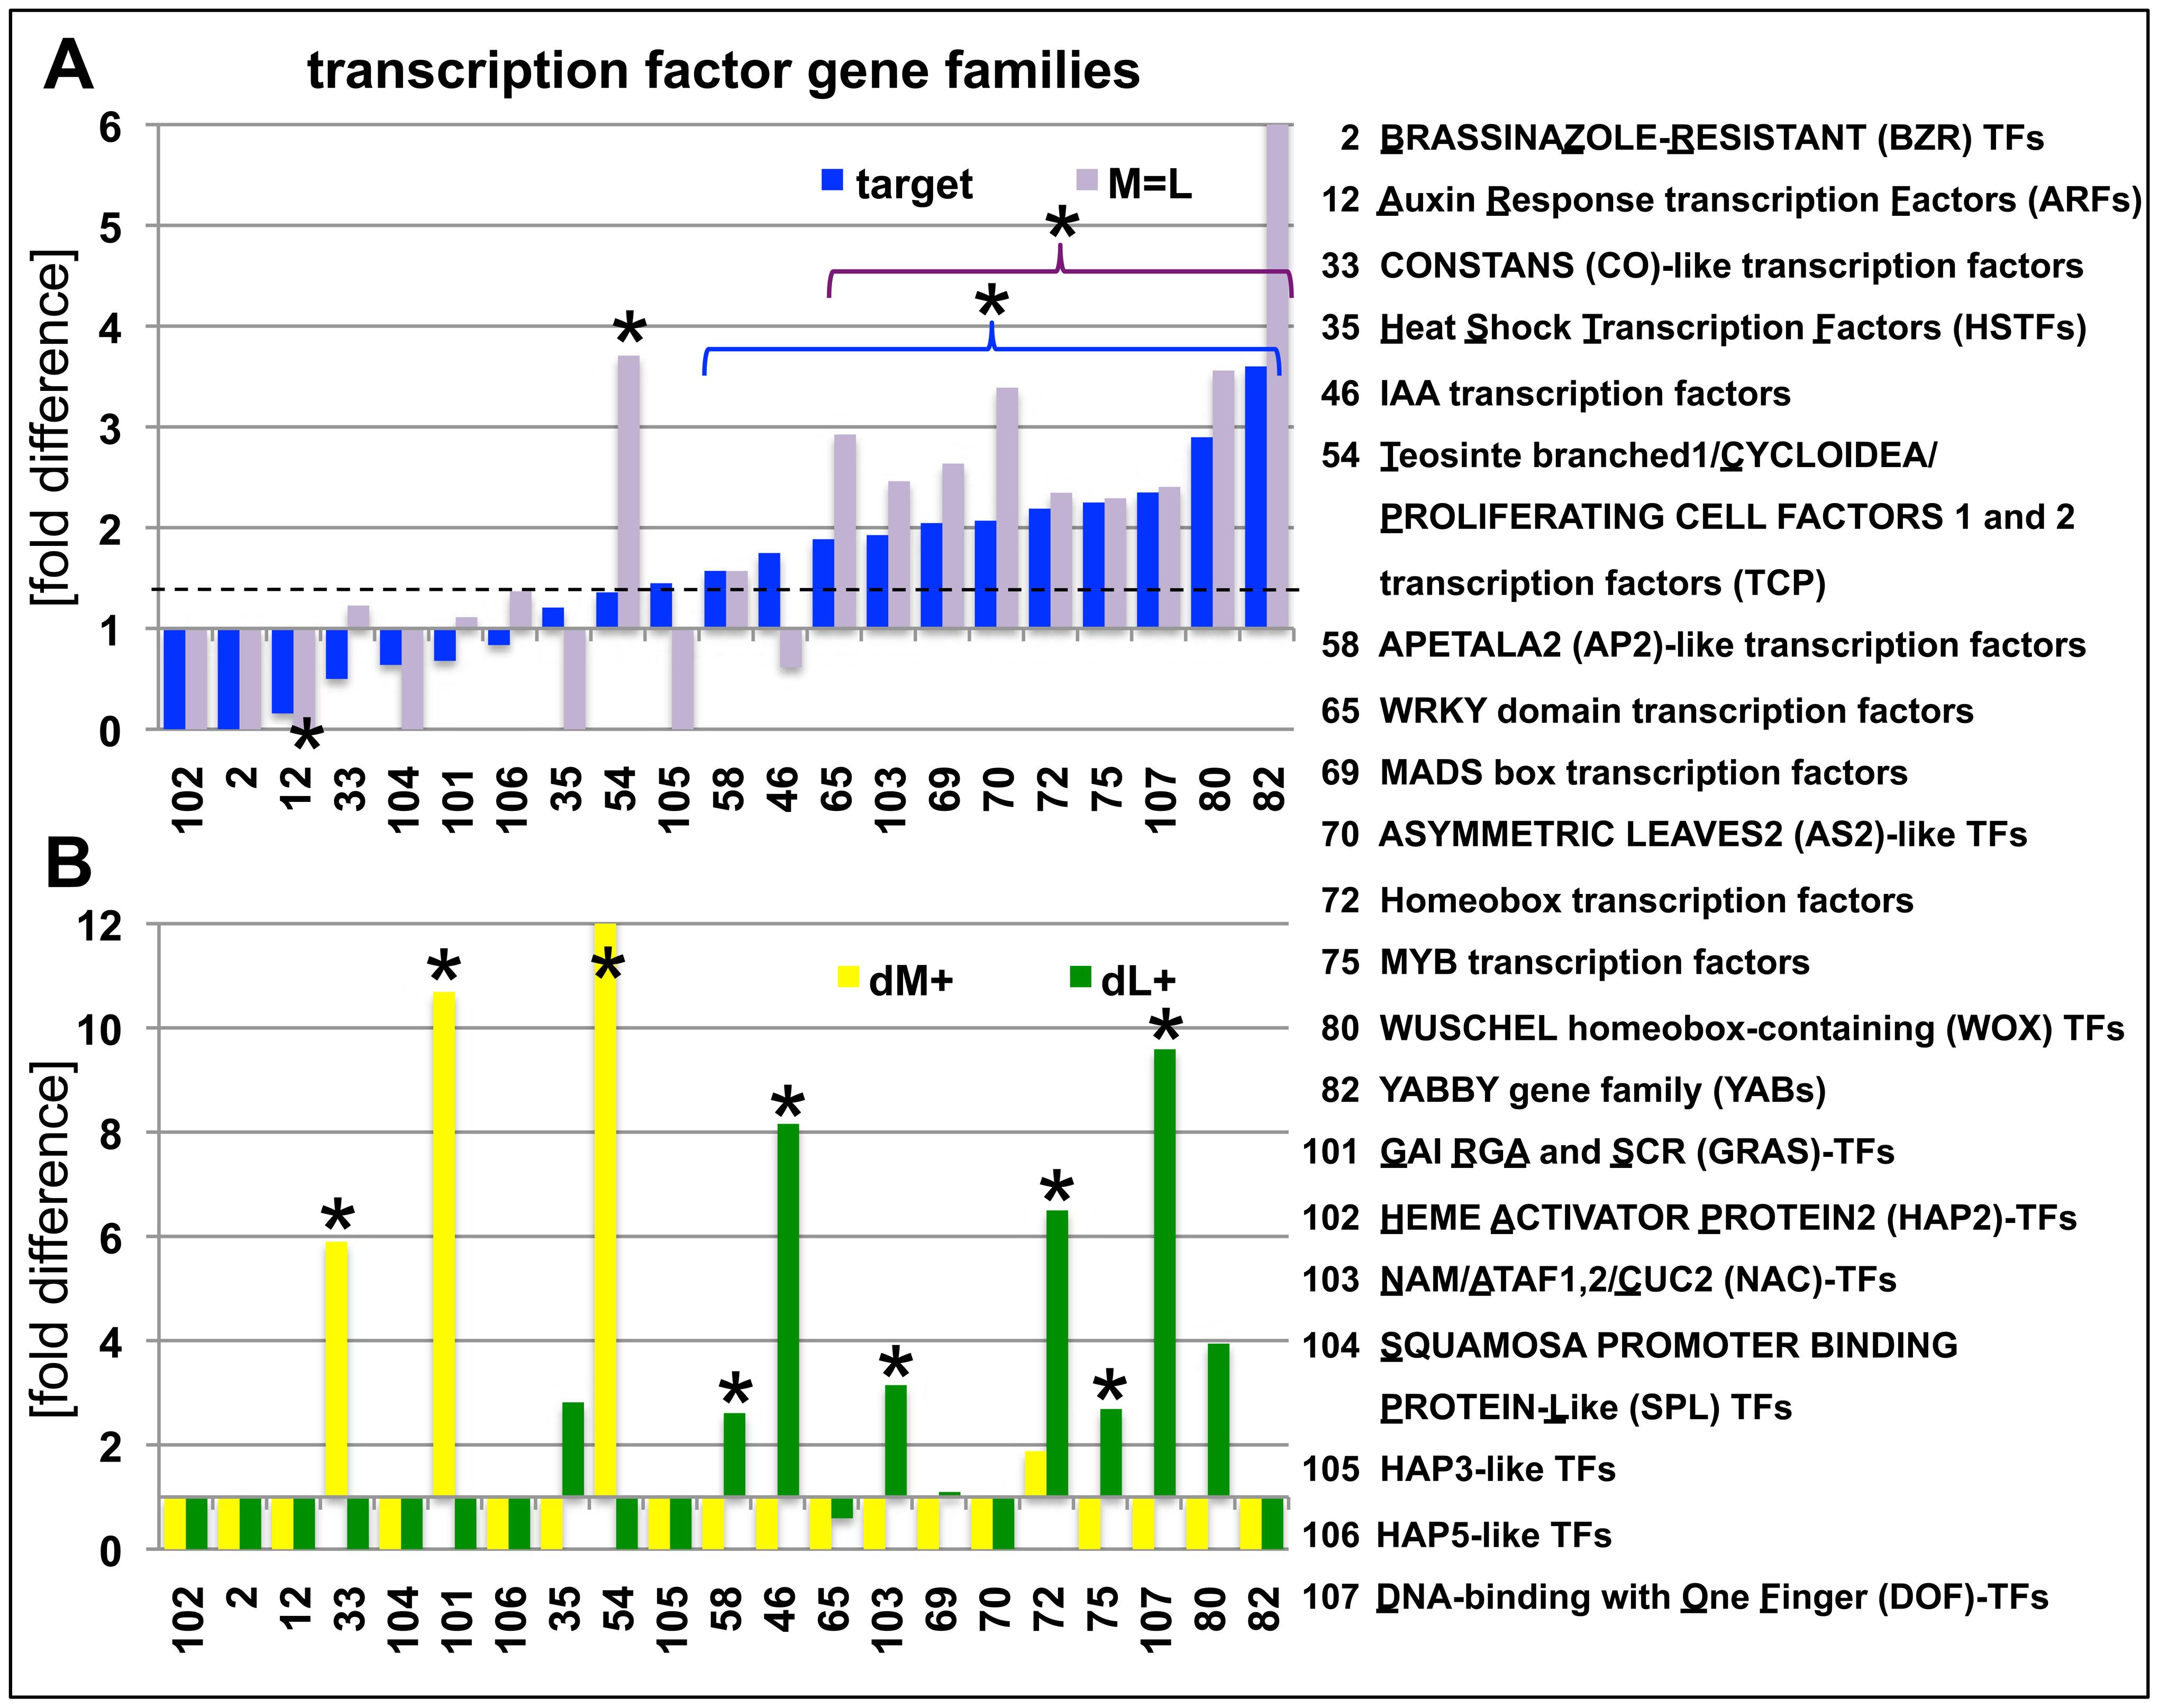 Abundance of H3K27me3 target genes in transcription factor gene families.